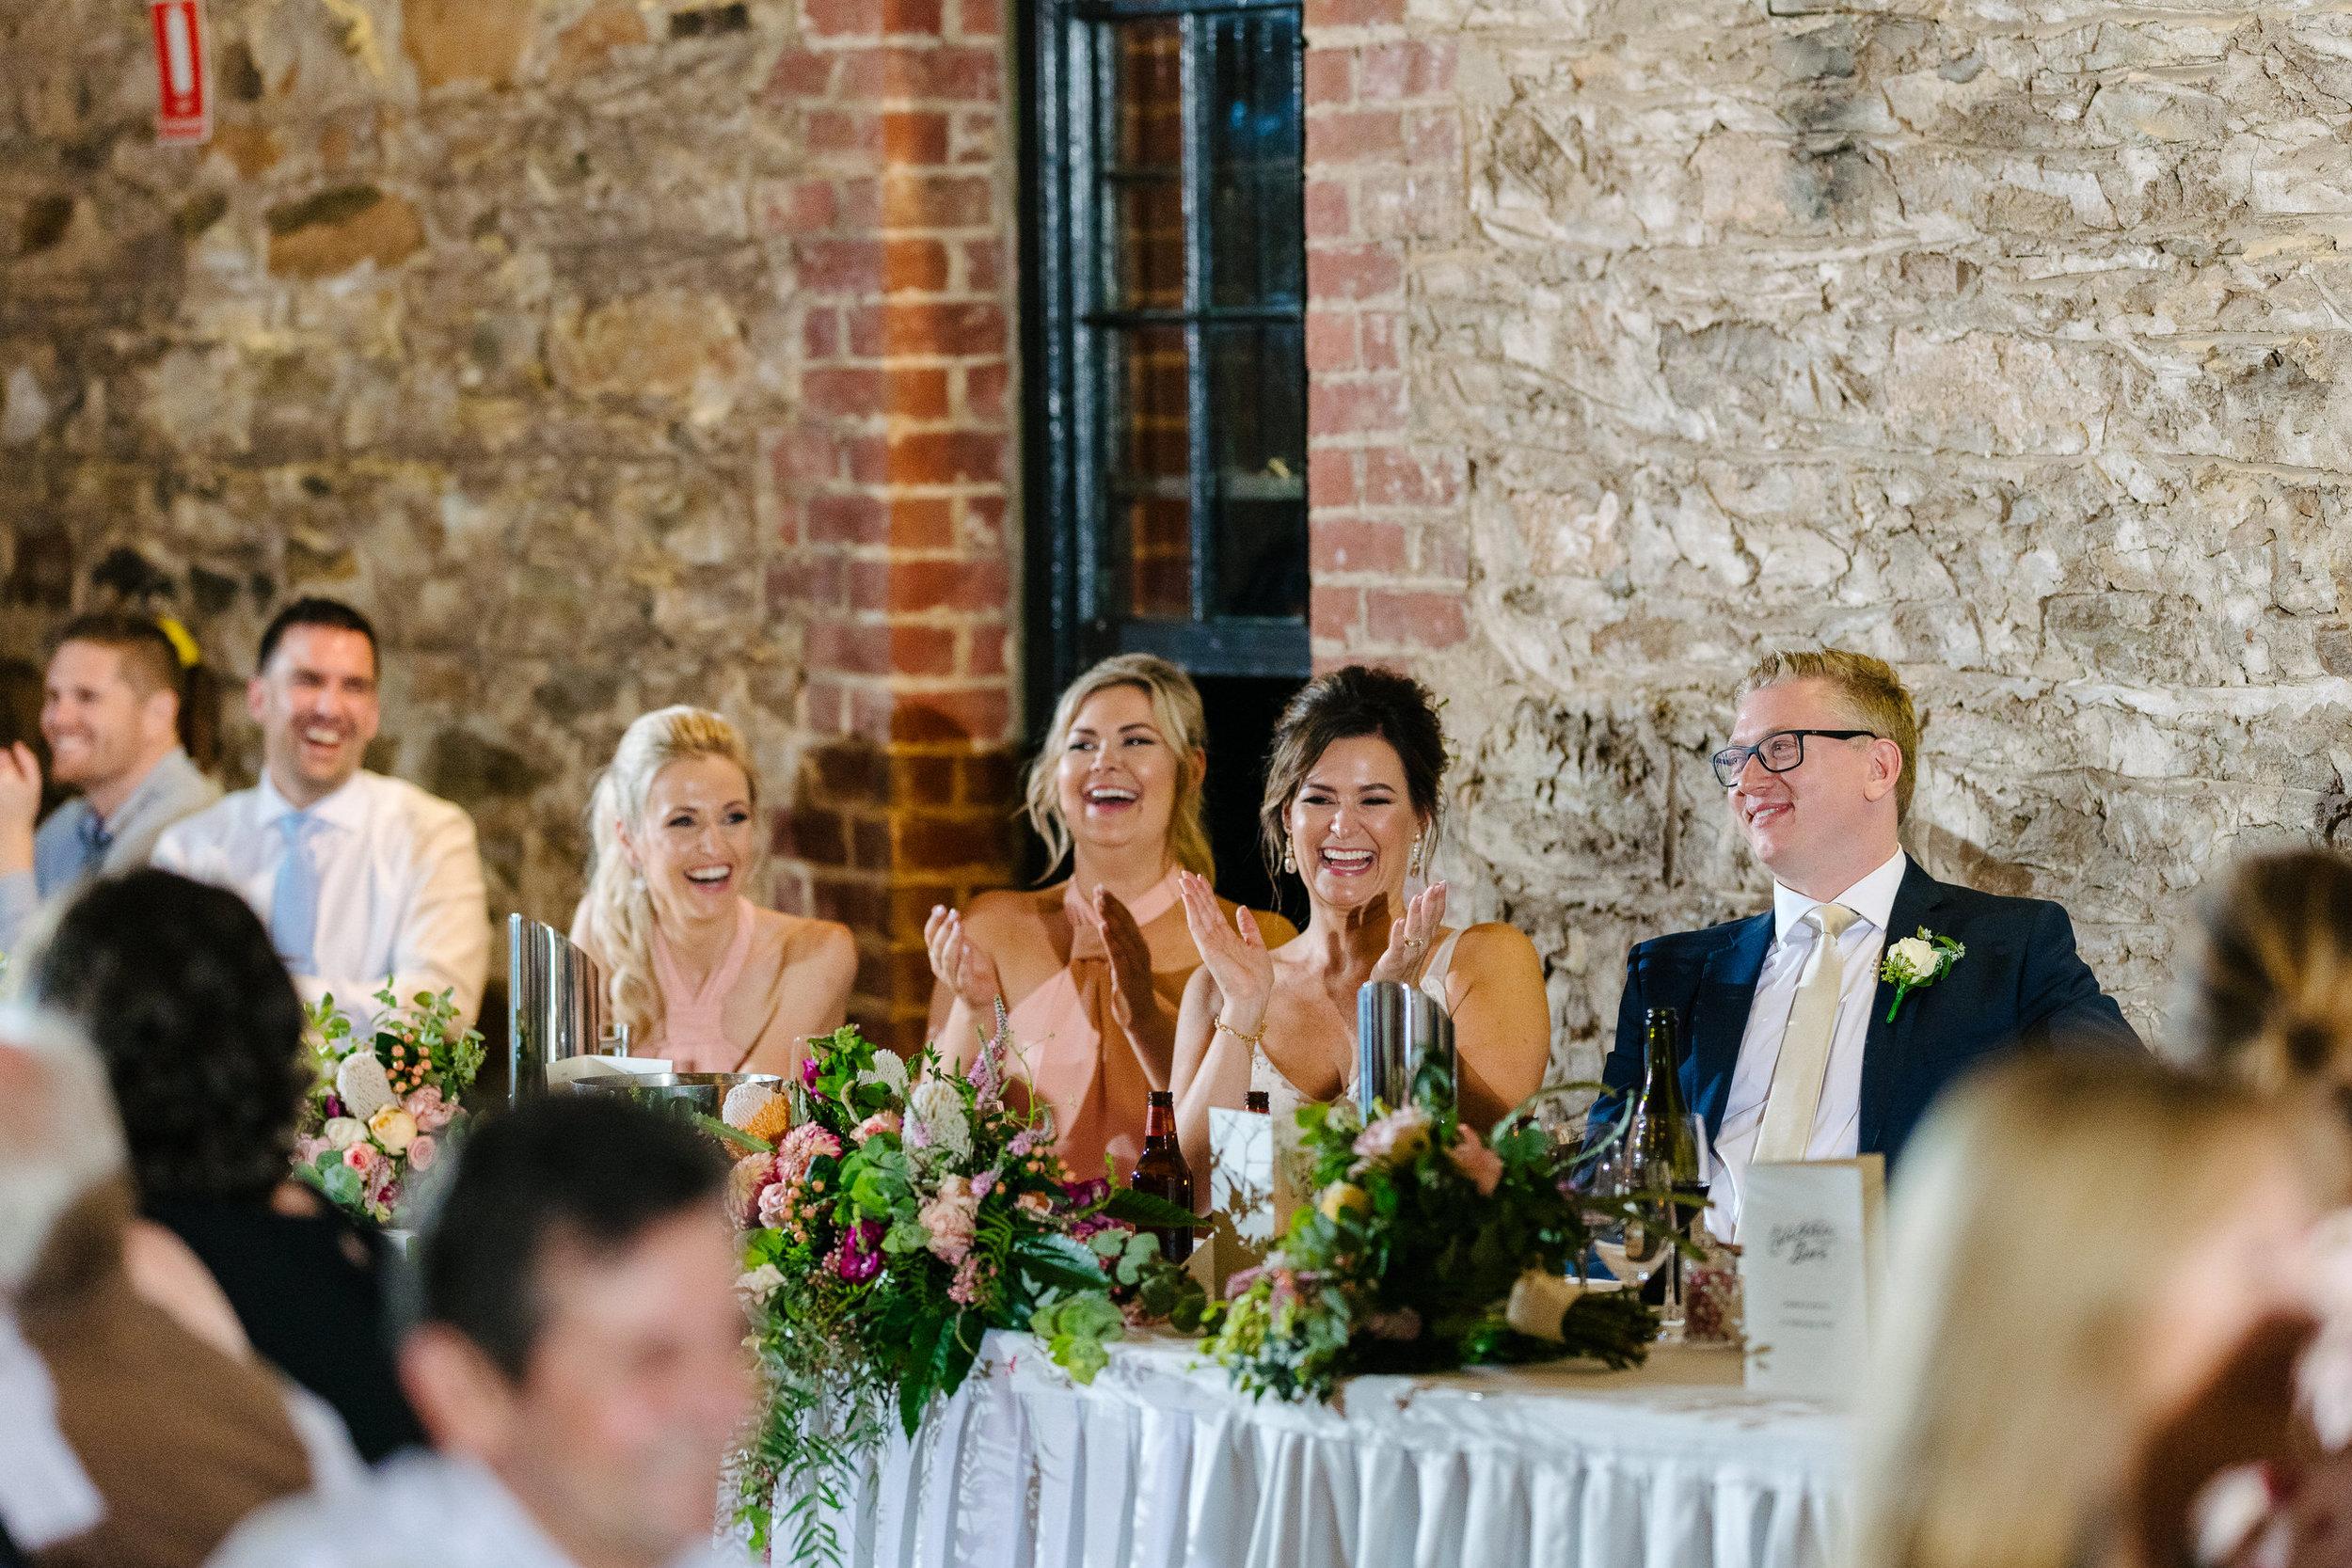 Justin_And_Jim_Photography_Chateau_Dore_Bendigo_Wedding90.JPG